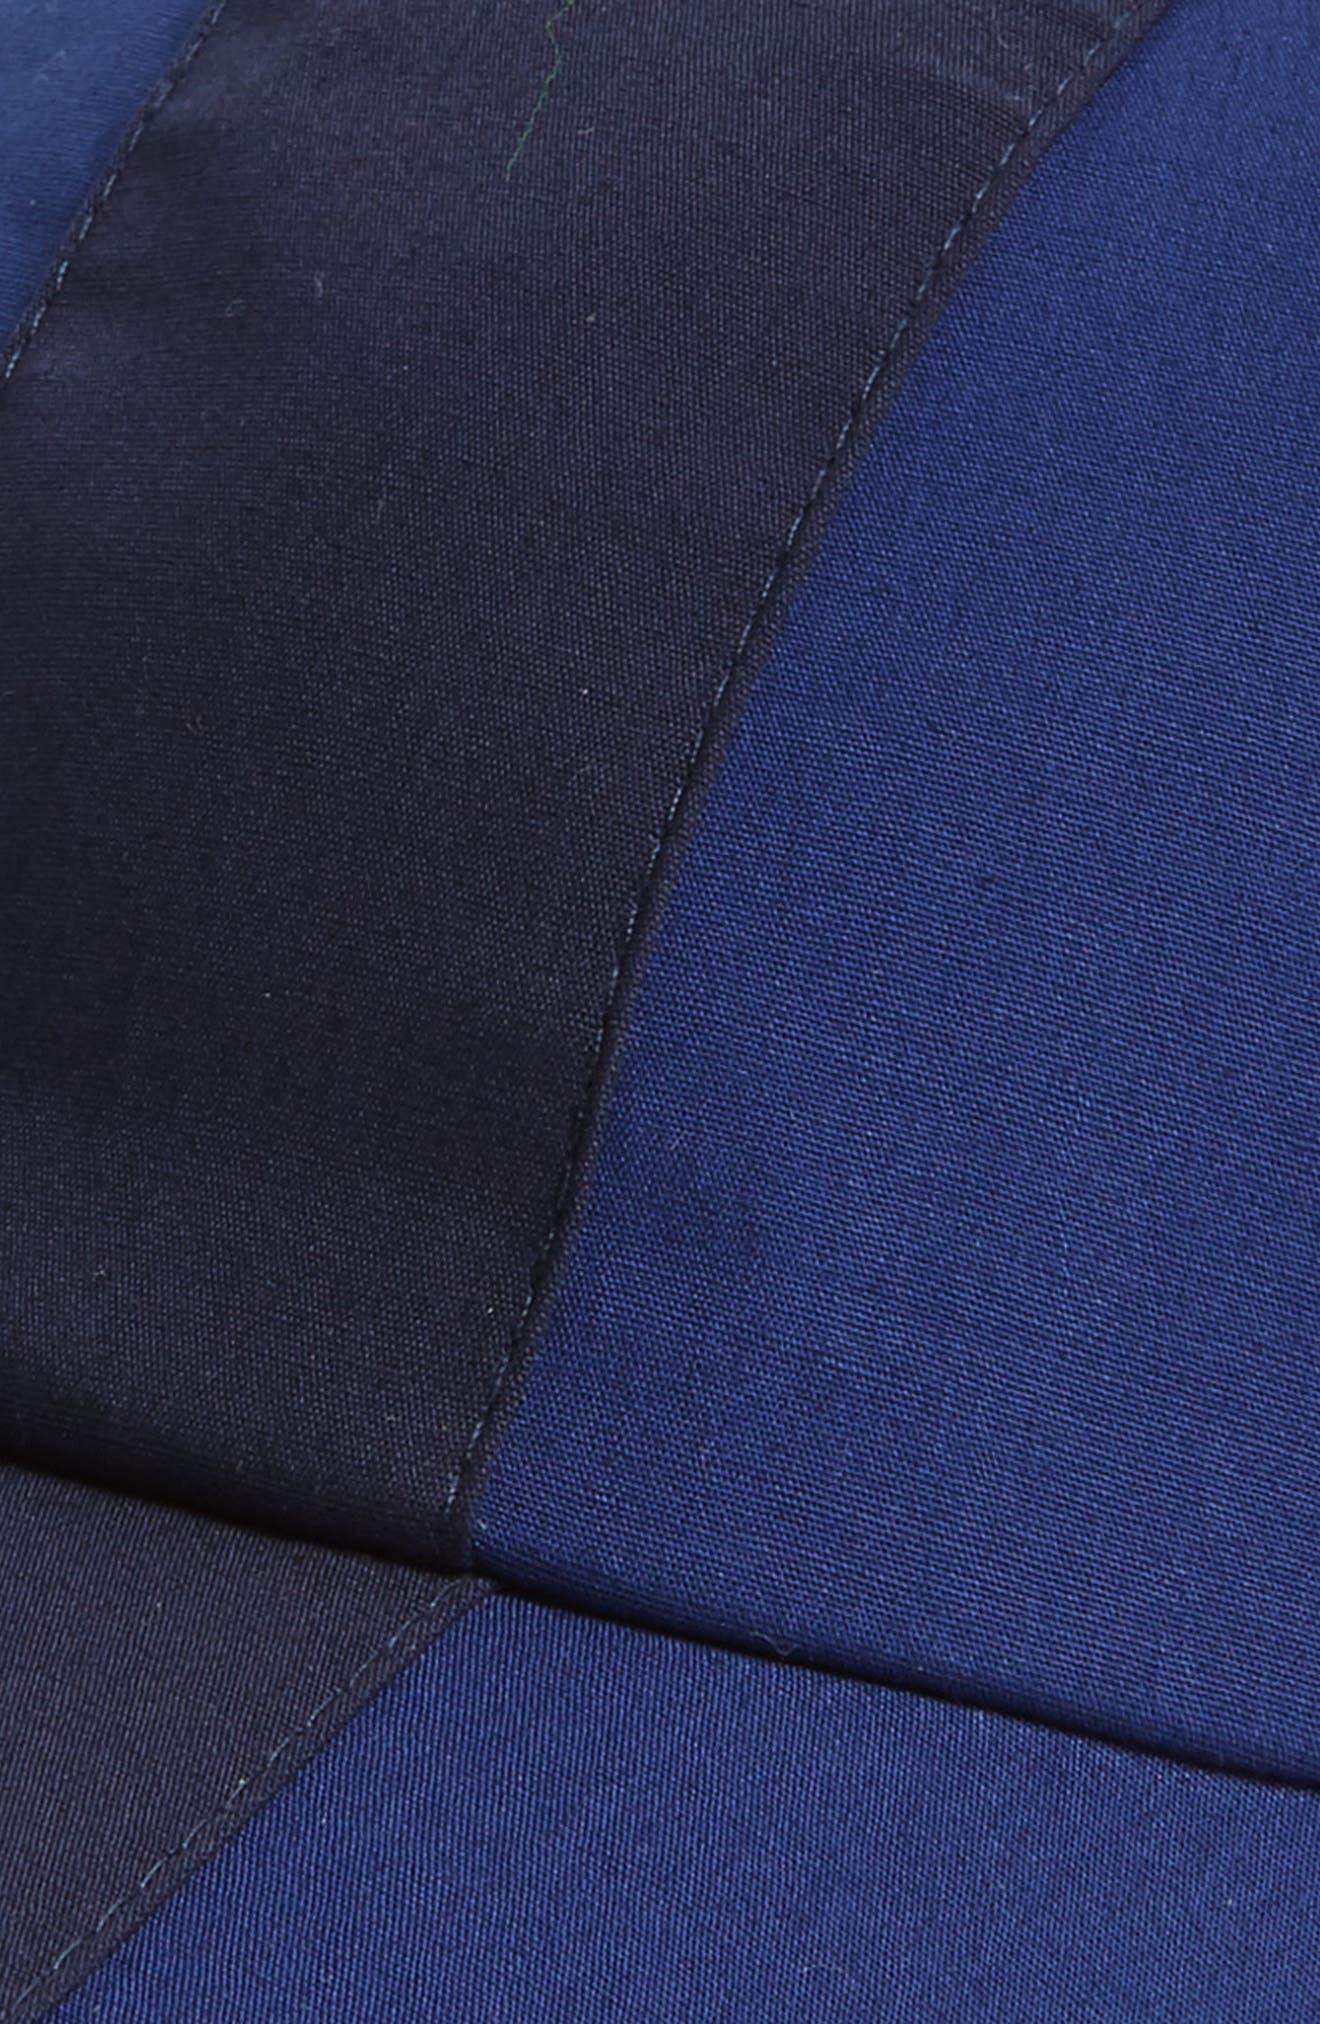 Colorblock Baseball Cap,                             Alternate thumbnail 3, color,                             Methylene/ Navy Blue